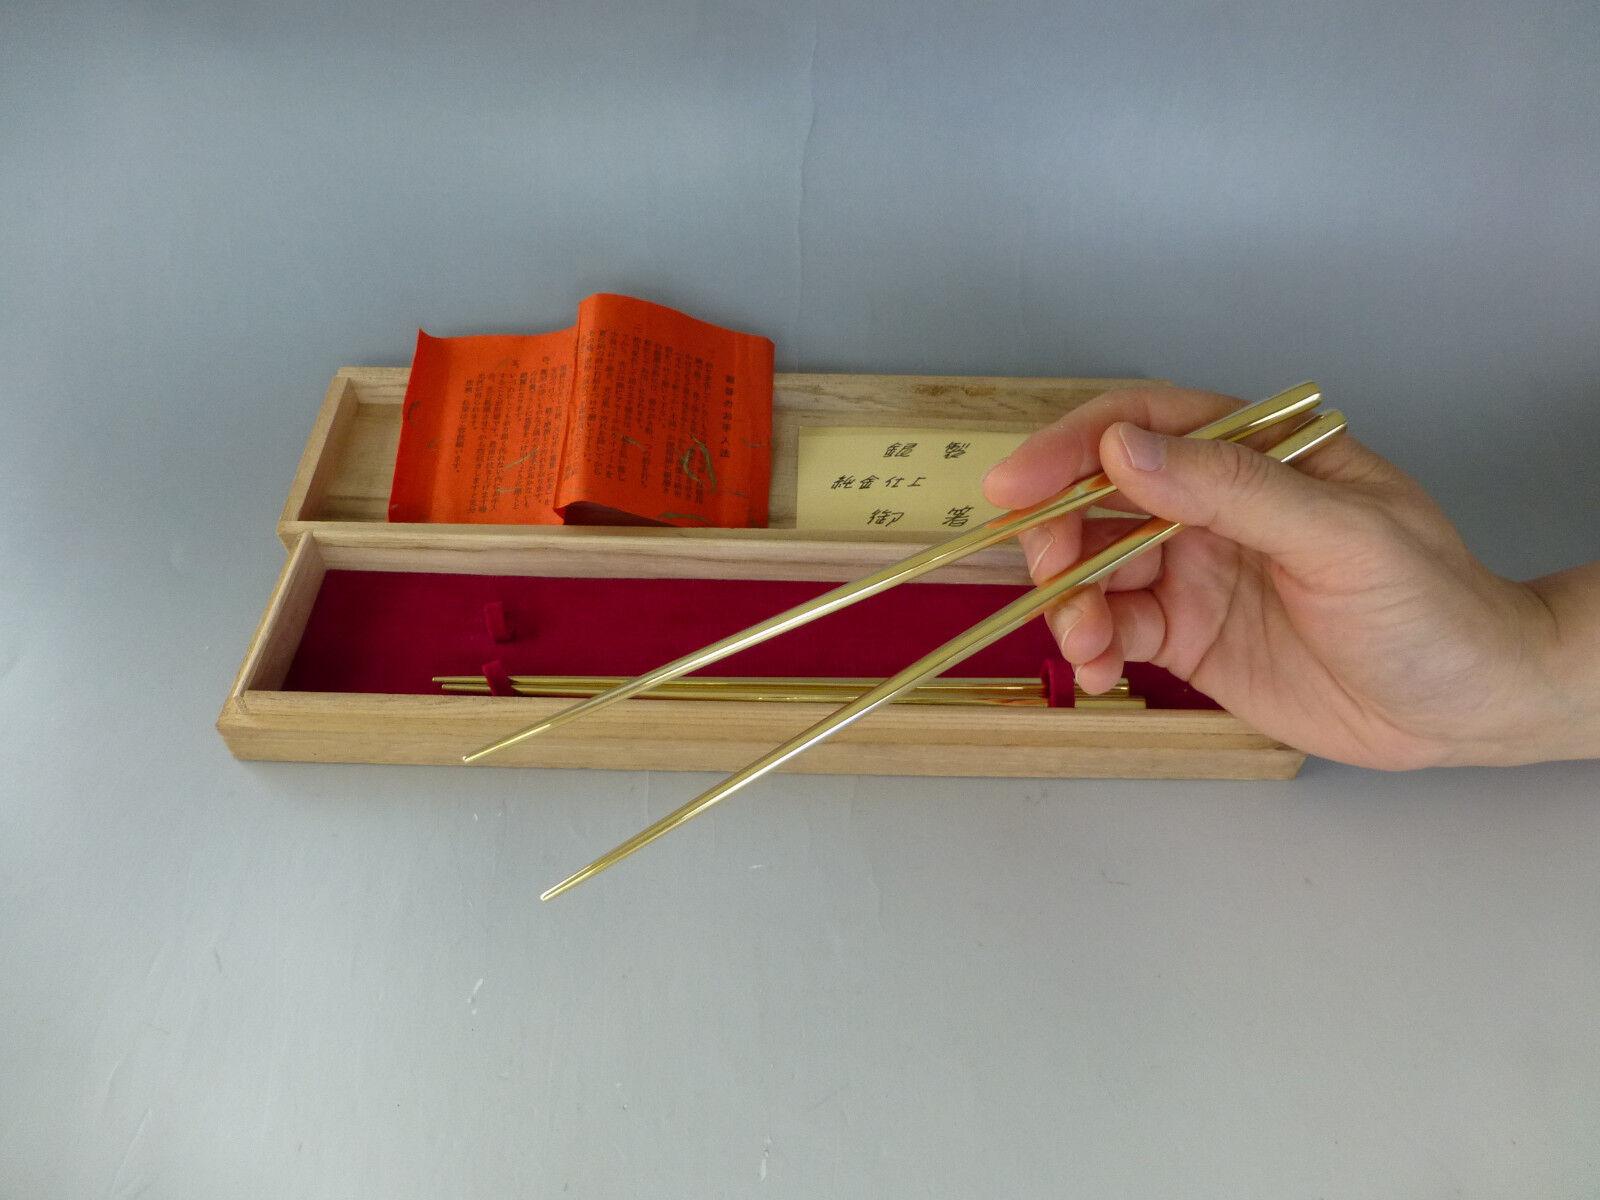 ANTIQUE JAPANESE STERLING SILVER WITH GOLD GILT CHOPSTICKS 2 SET IN WOODEN CASE